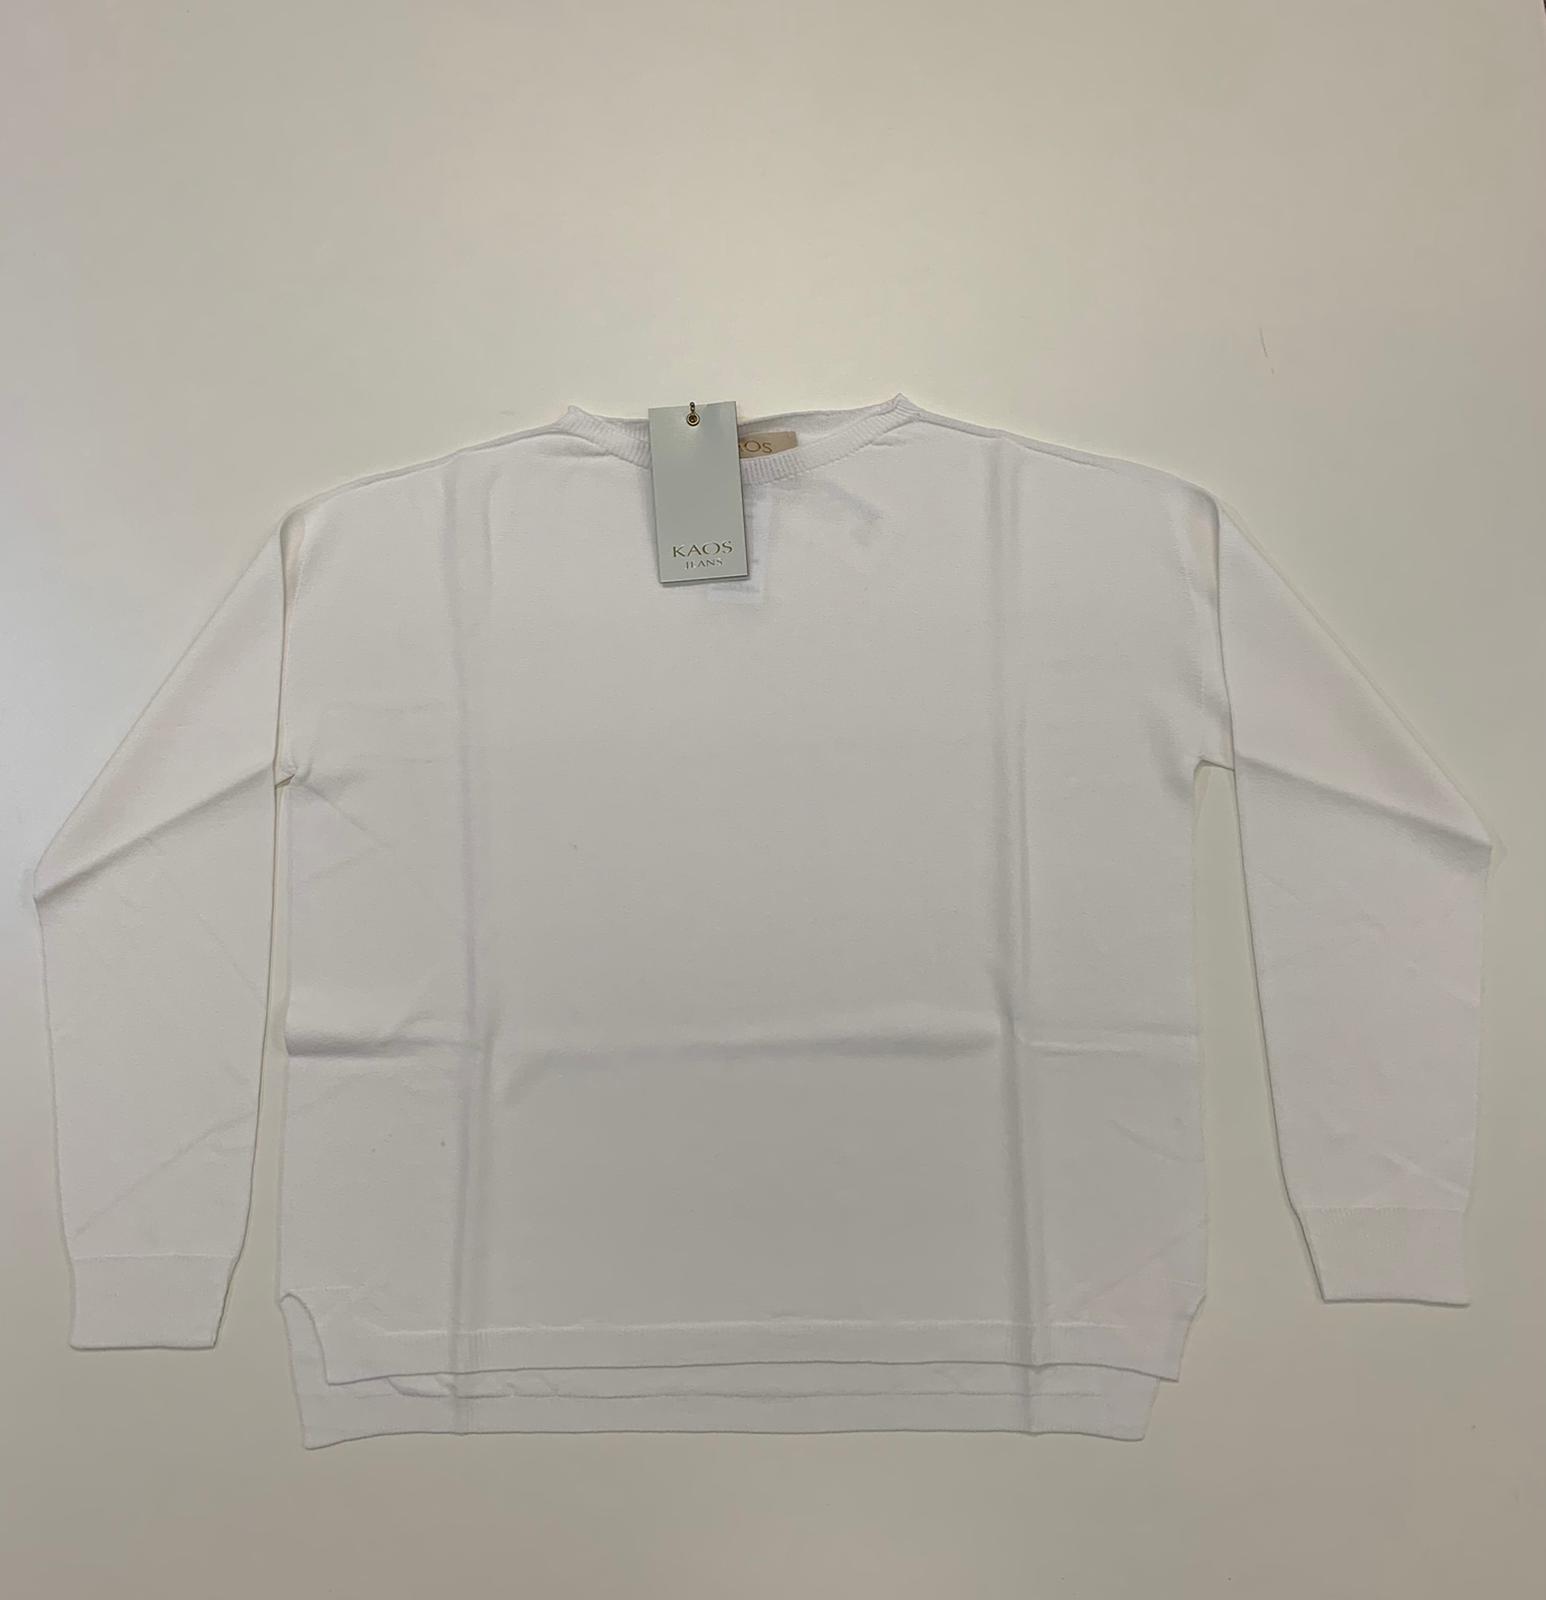 Maglia Kaos Jeans Viscosa Bianco